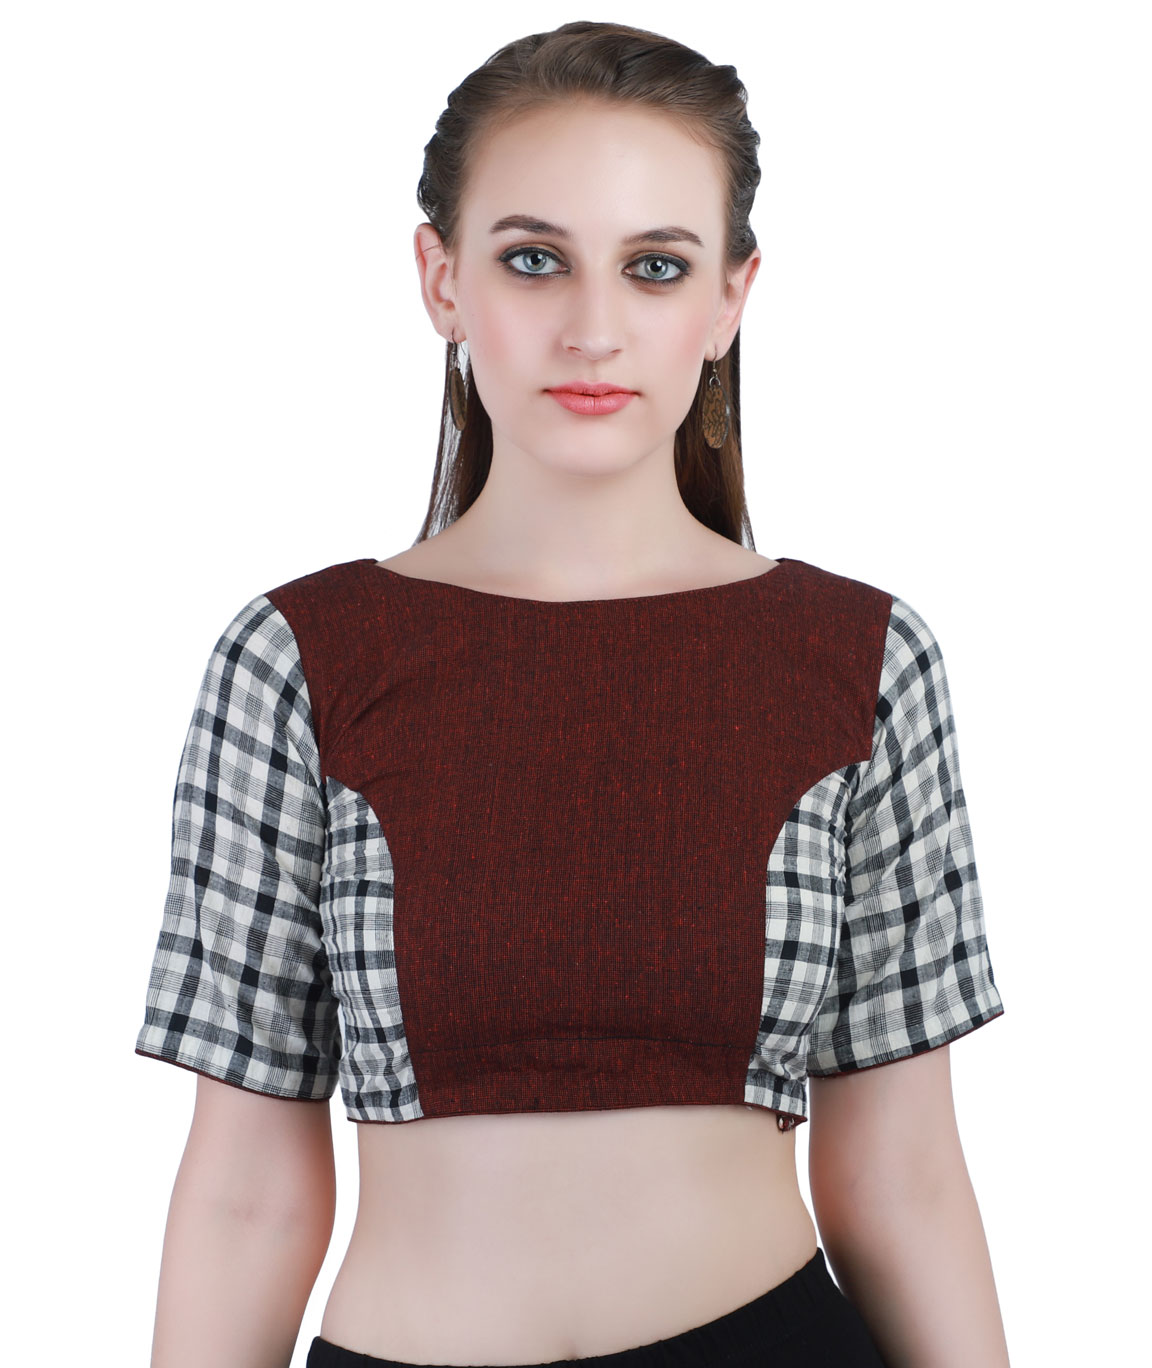 Handloom Pure Cotton khadi Checks Back-Open Blouse in Maroon,White and Black